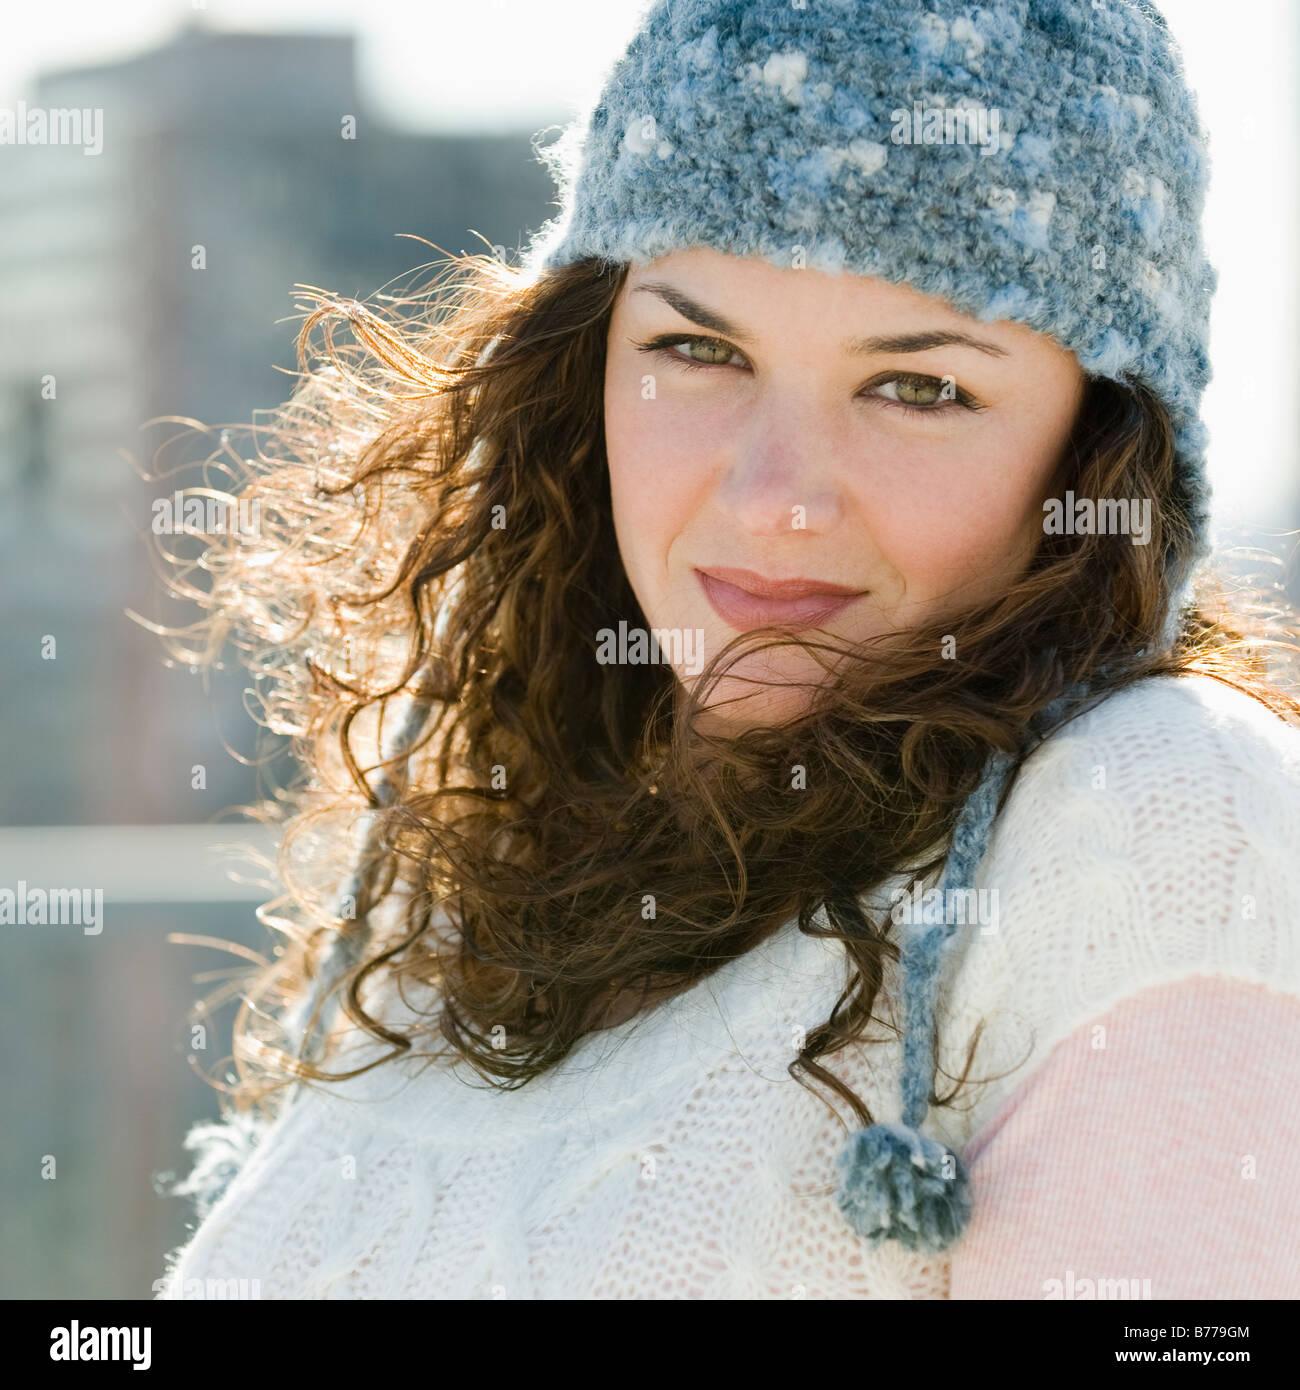 Portrait of woman stocking cap - Stock Image